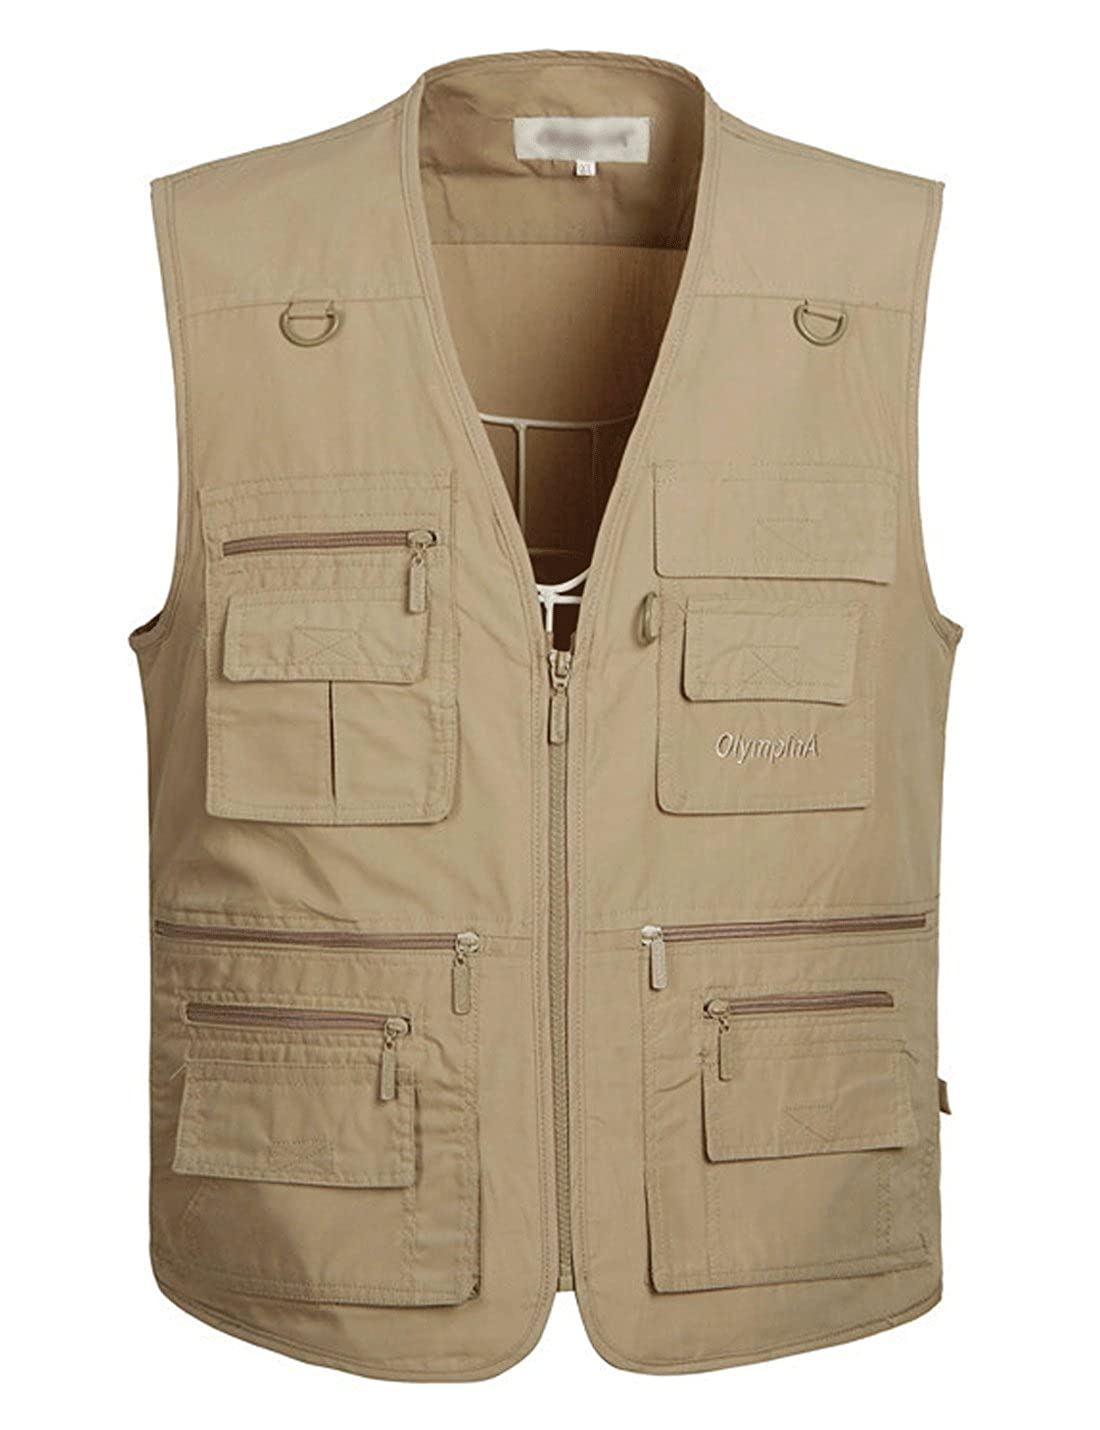 Yimoon Men's Summer Outdoor Pockets Lightweight Utility Fishing Travel Vest